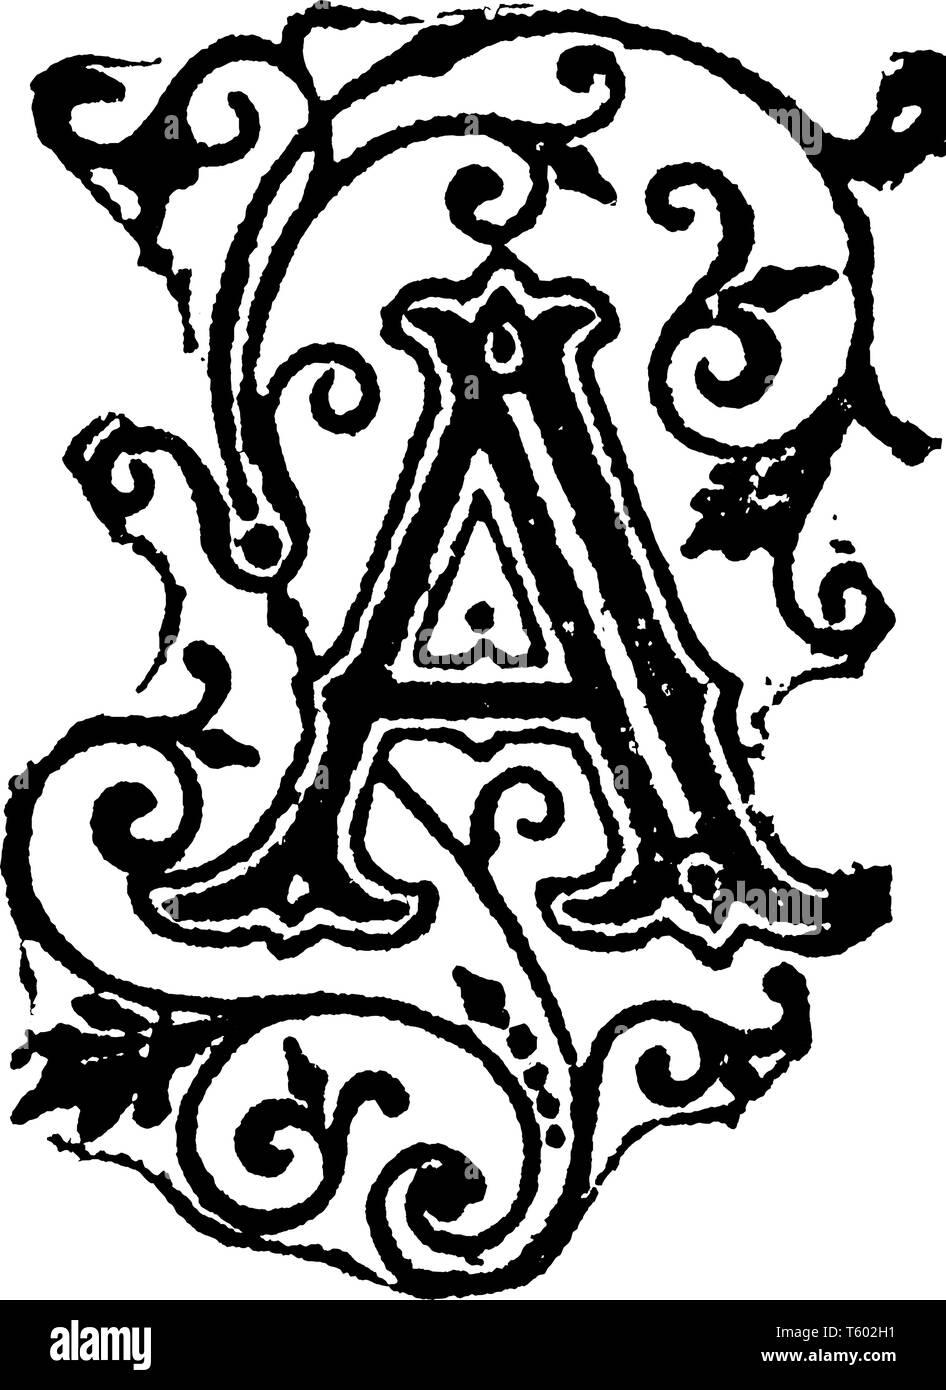 Decorative Letter A.A Decorative Capital Letter A Vintage Line Drawing Or